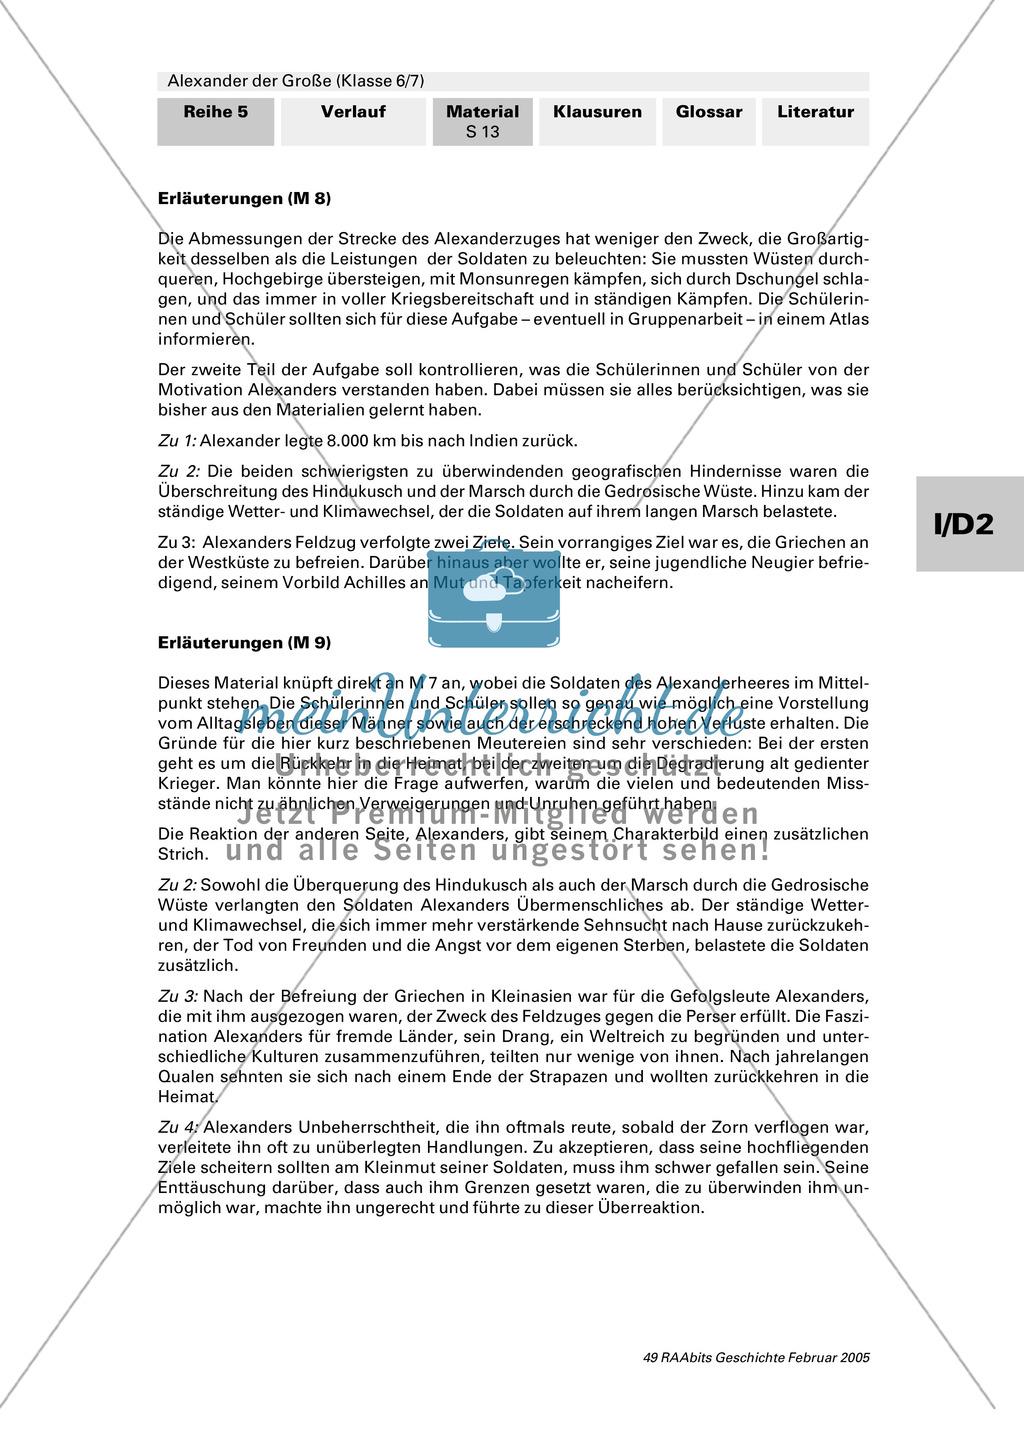 Alexander der Große: Eroberungsfeldzüge an Autorentexten, Karten, Bildern Preview 8